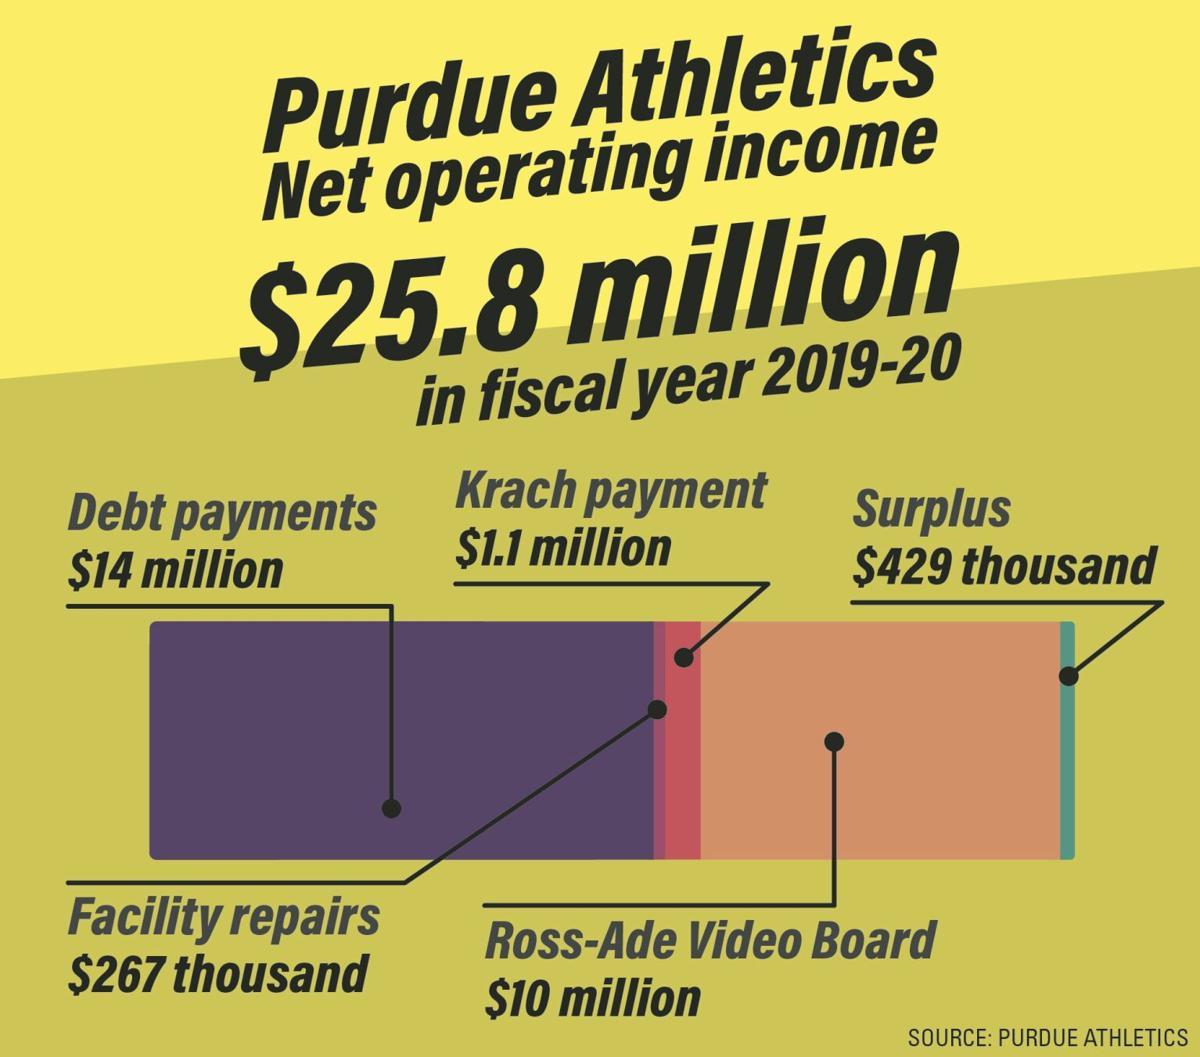 Purdue Athletics Operating Income Breakdown